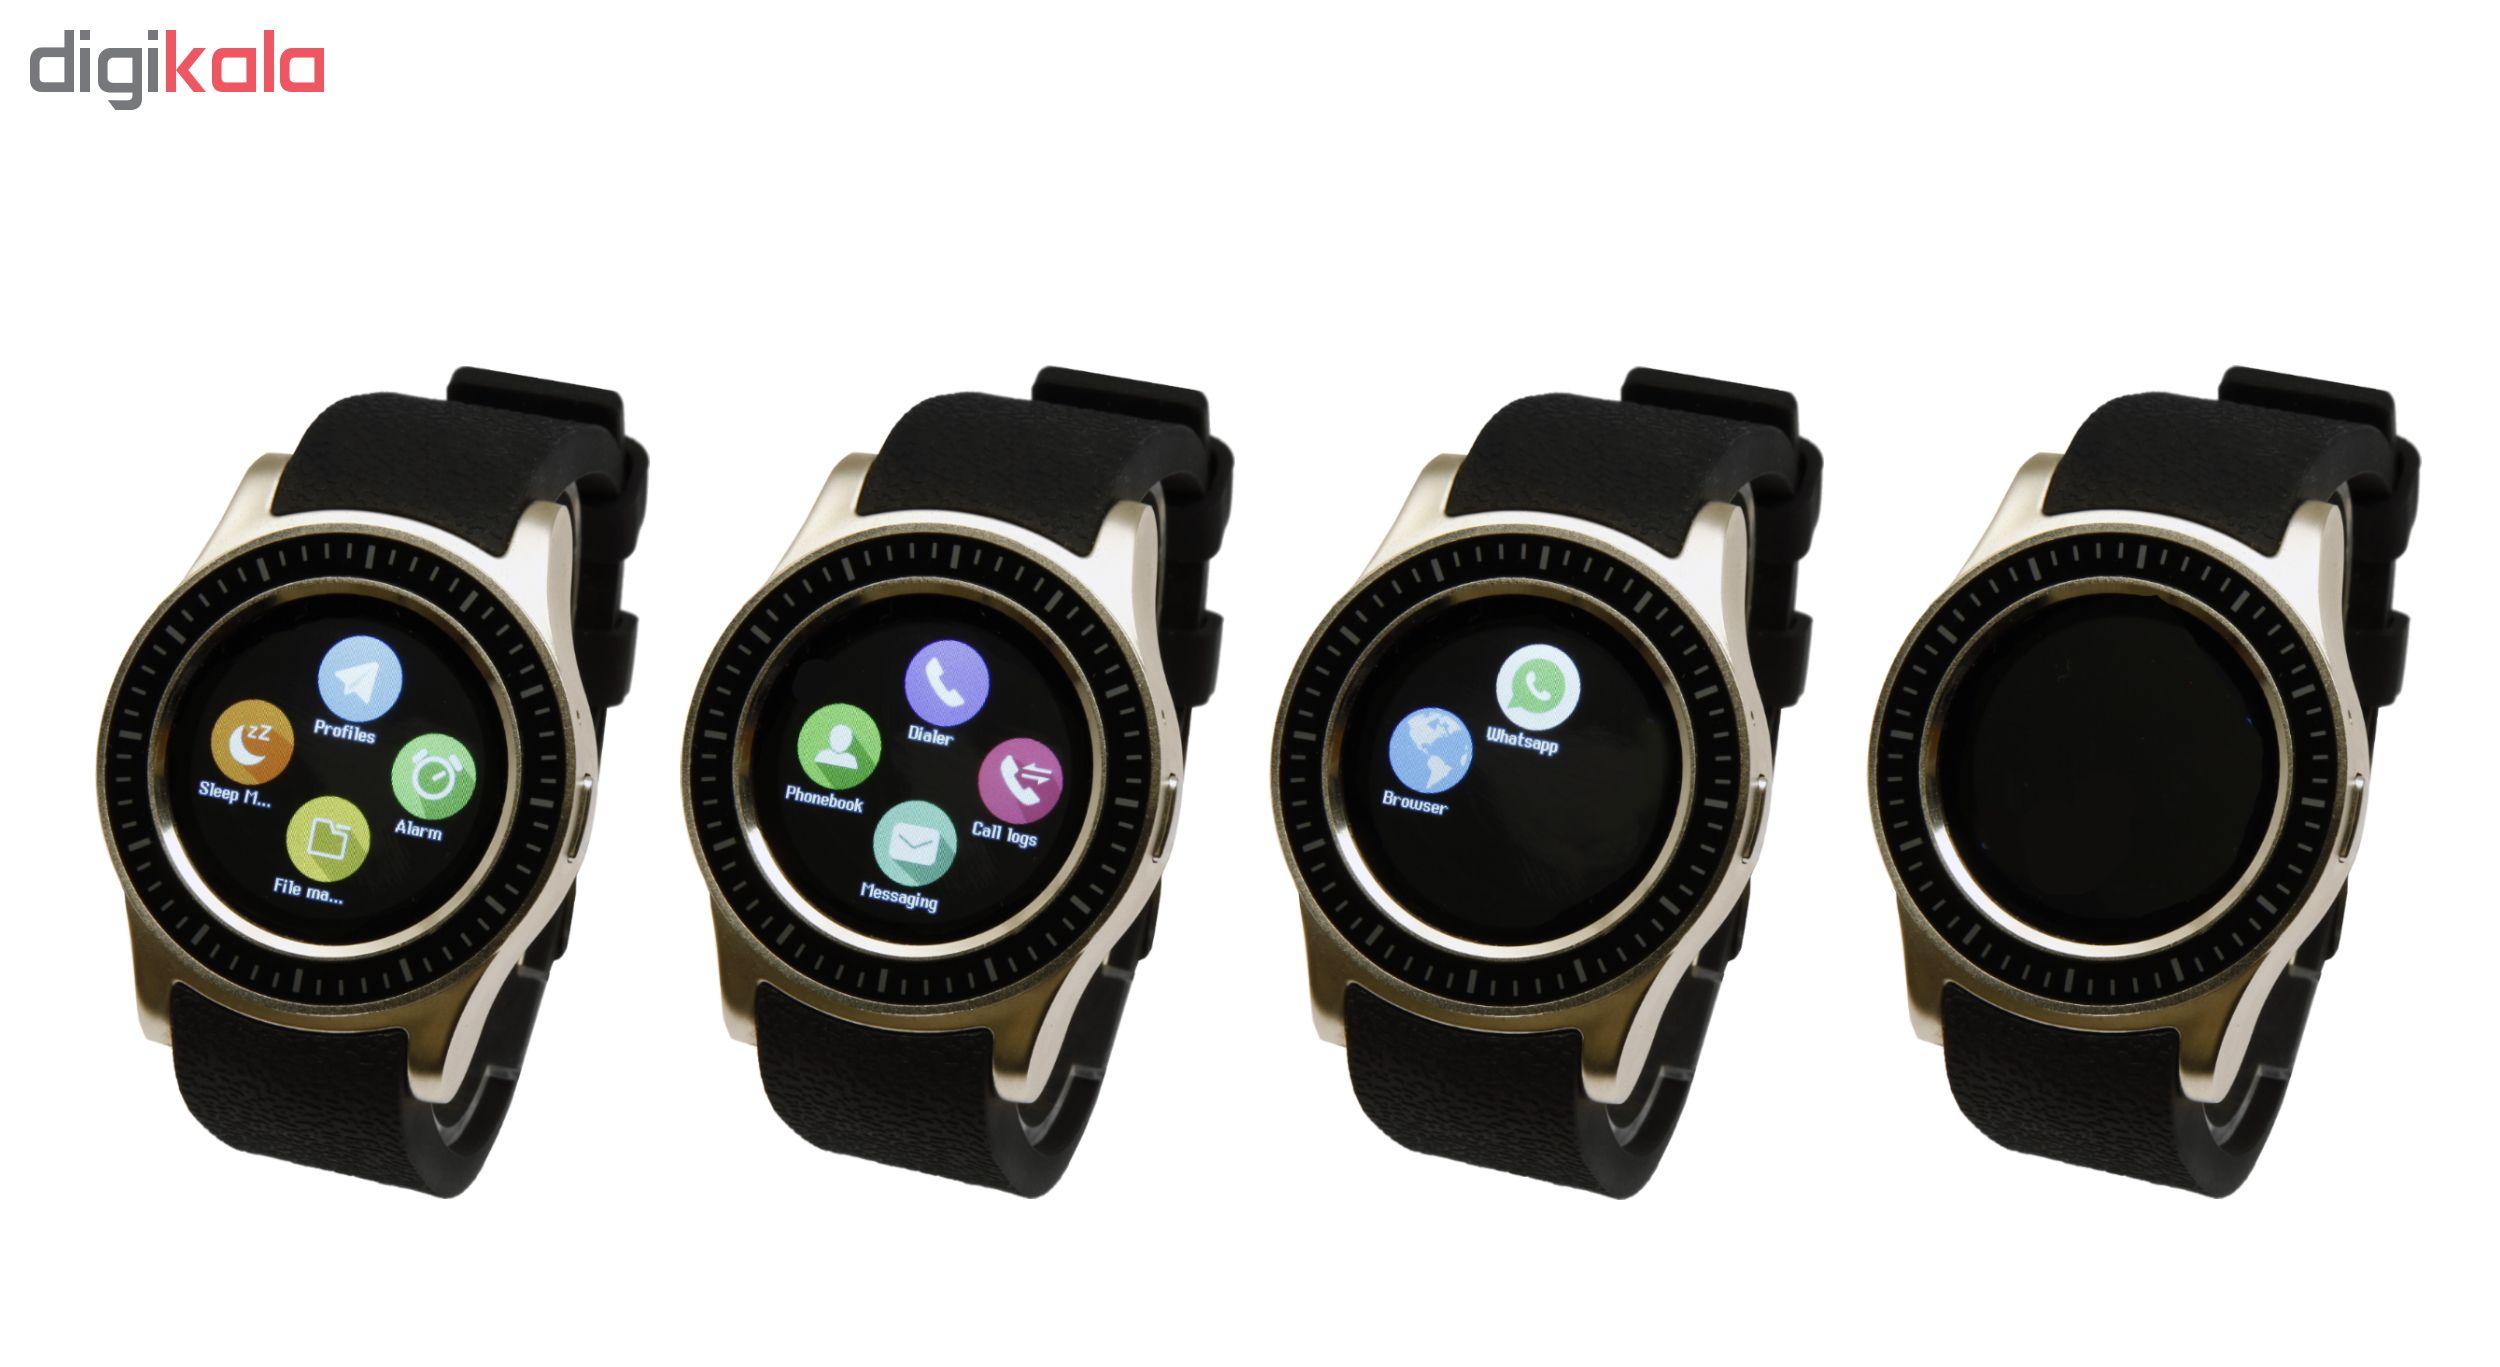 ساعت هوشمند جی تب مدل S1 main 1 8